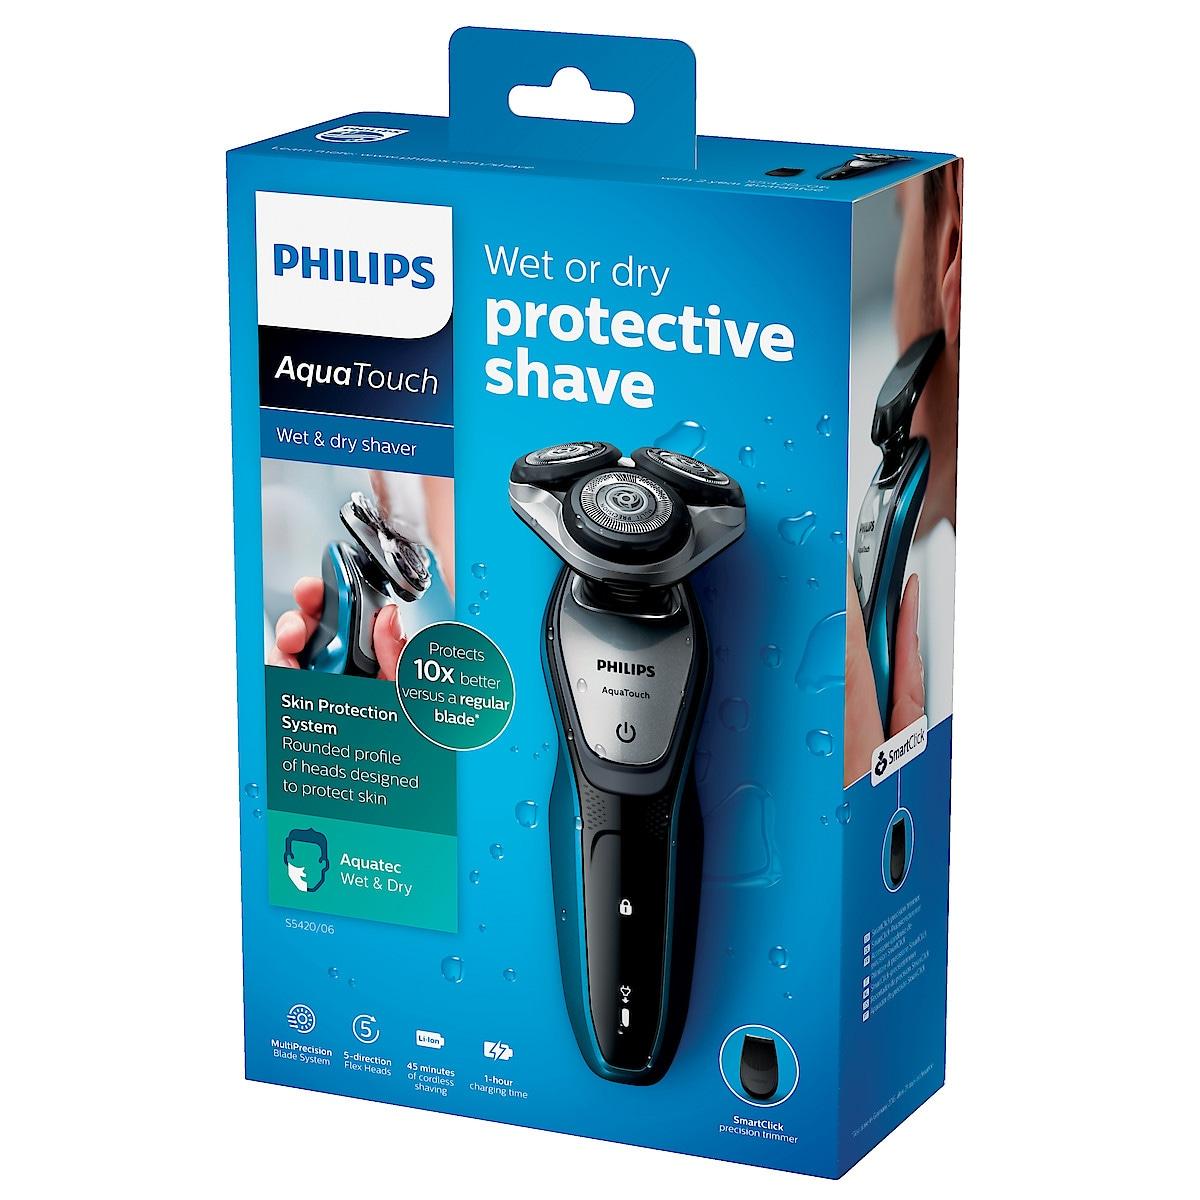 Partakone Philips AquaTouch S5420/06